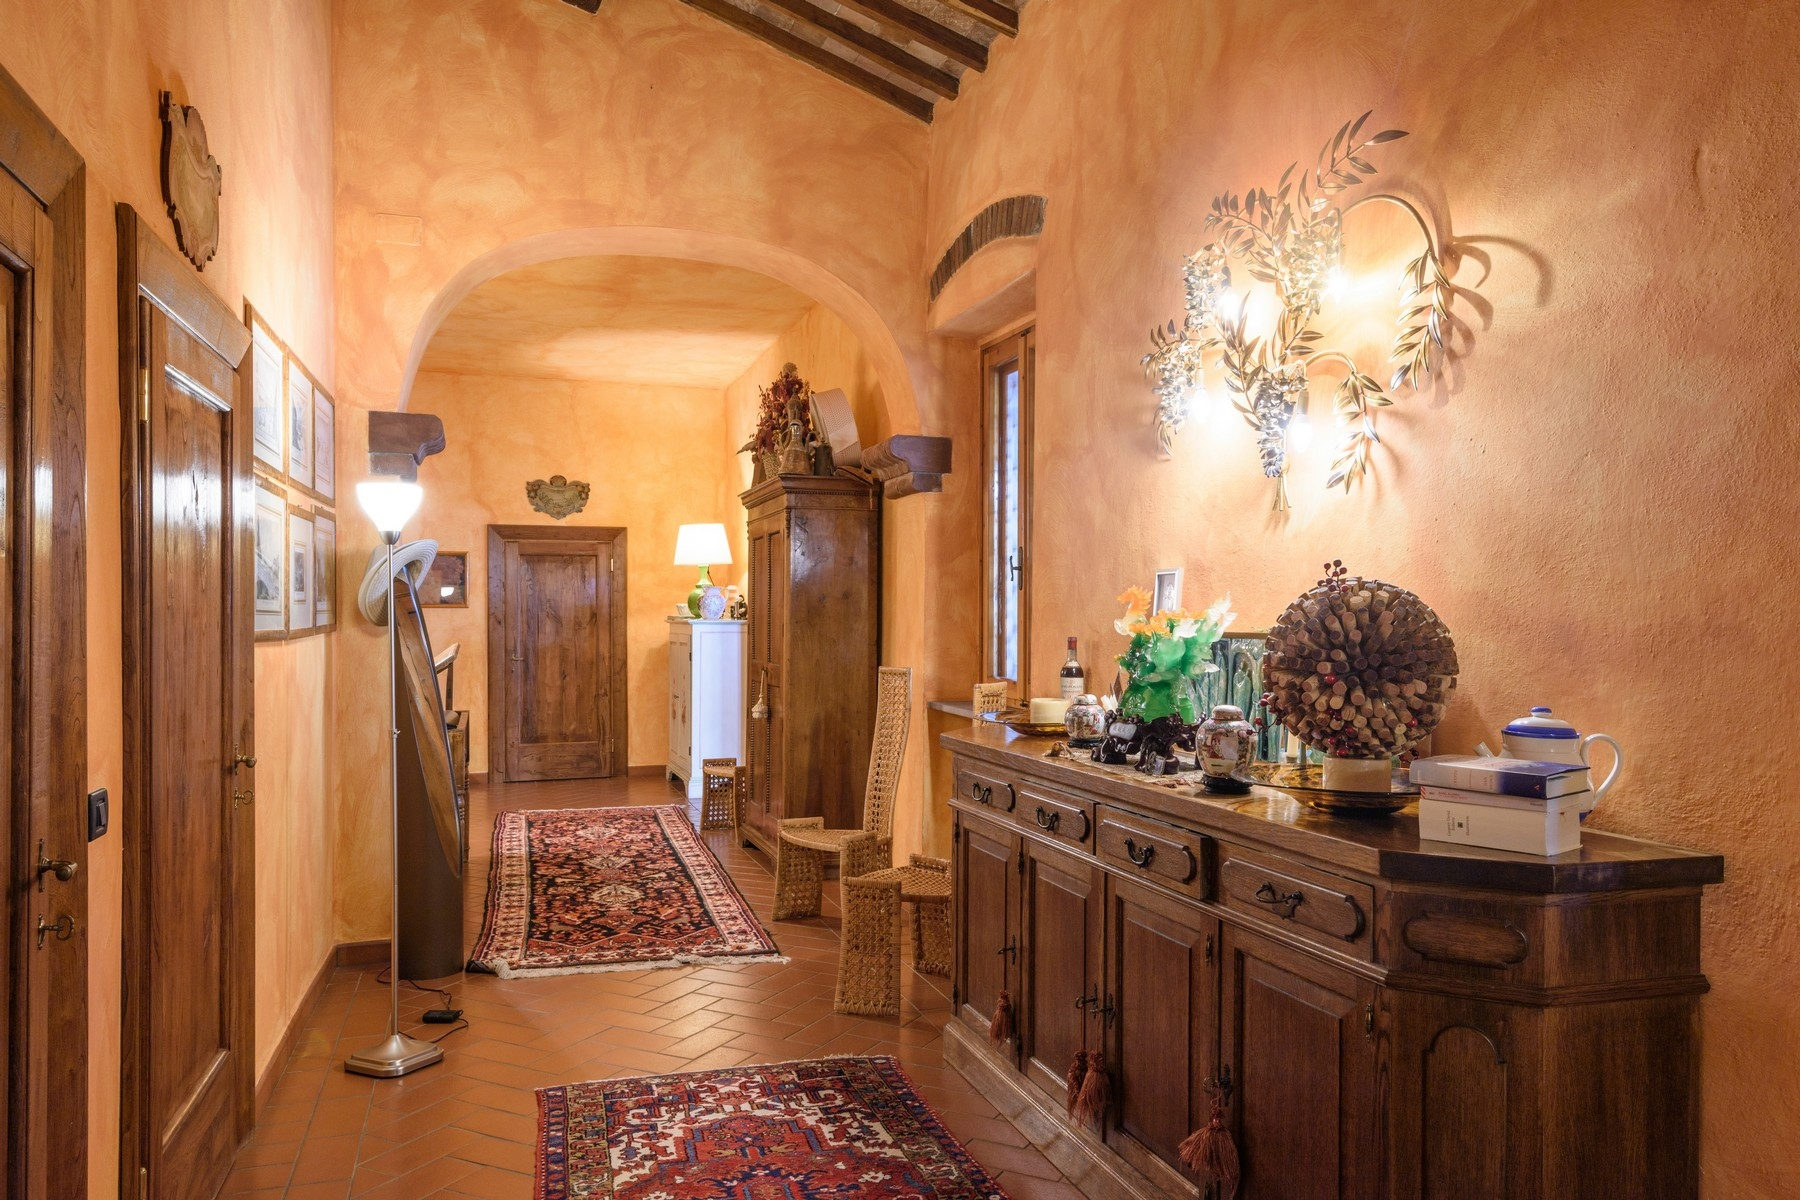 Villa in Vendita a Greve In Chianti: 5 locali, 491 mq - Foto 5